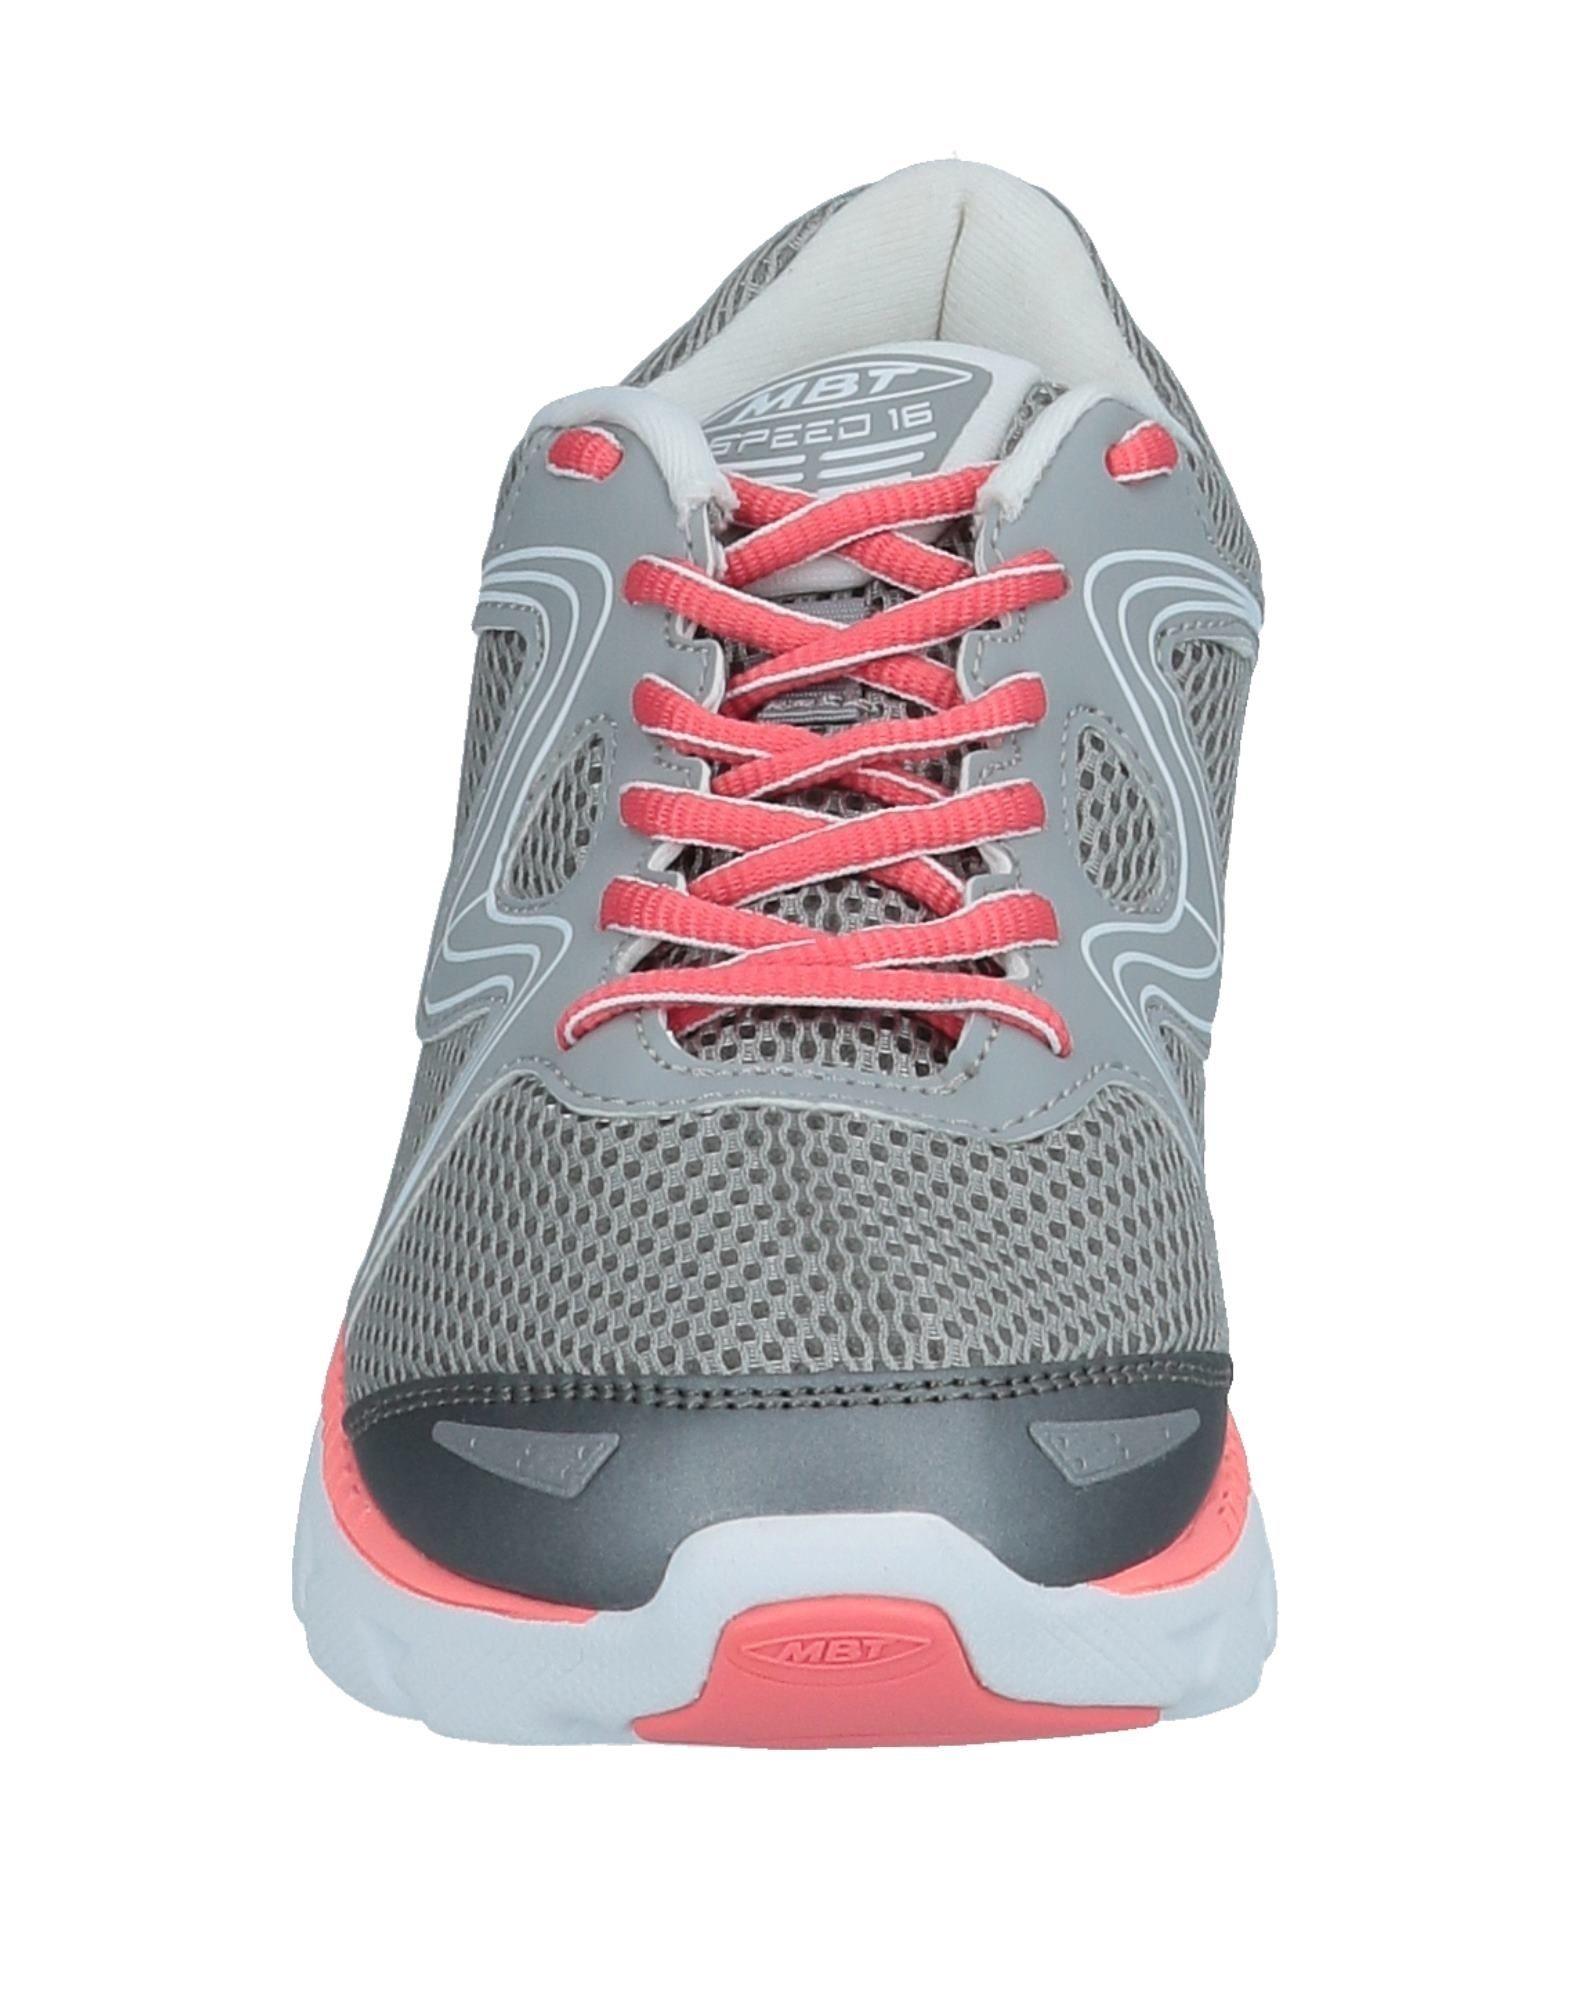 Mbt Sneakers - Women Mbt Sneakers online online online on  United Kingdom - 11560993ON 25b97e